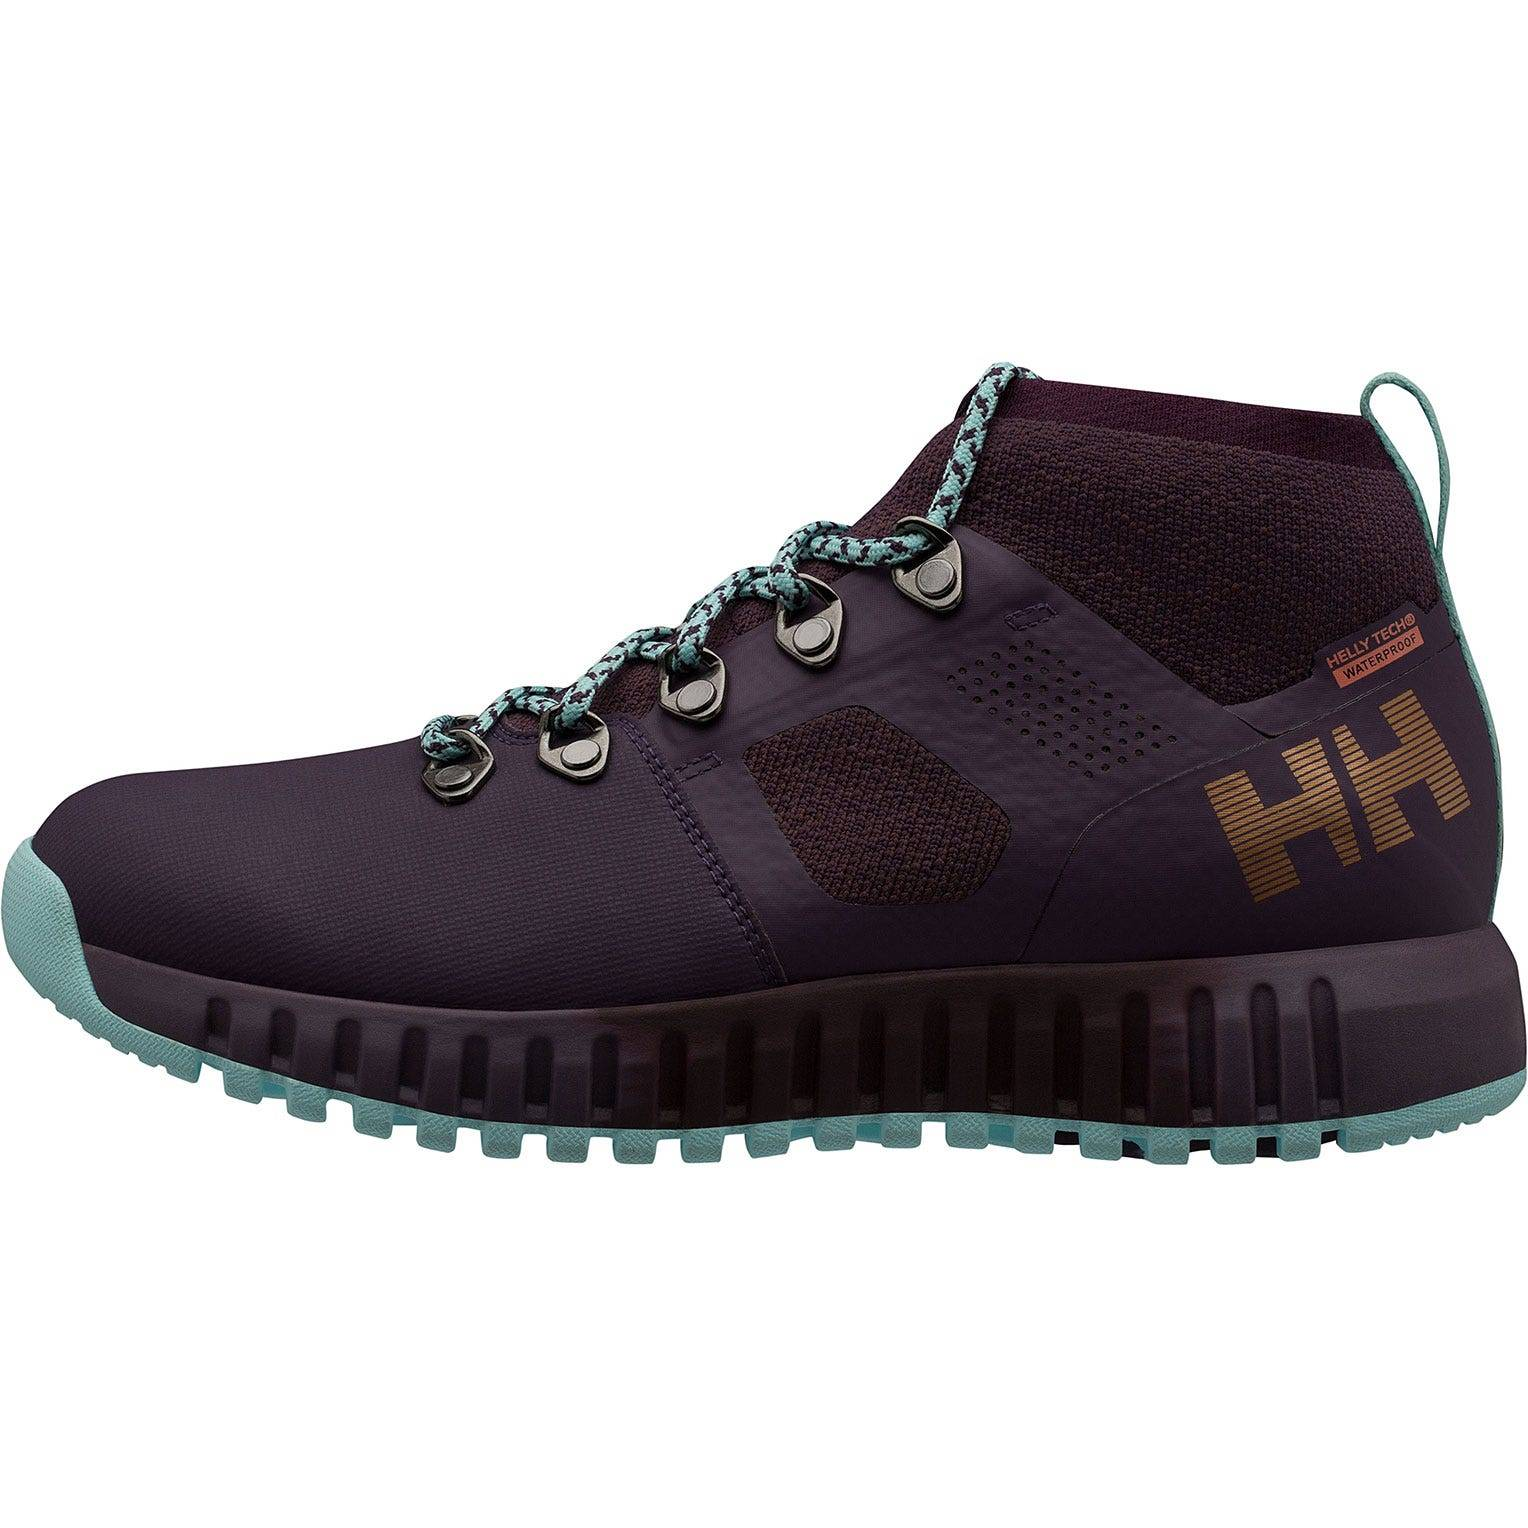 Helly Hansen W Vanir Canter Ht Womens Hiking Boot Purple 37.5/6.5